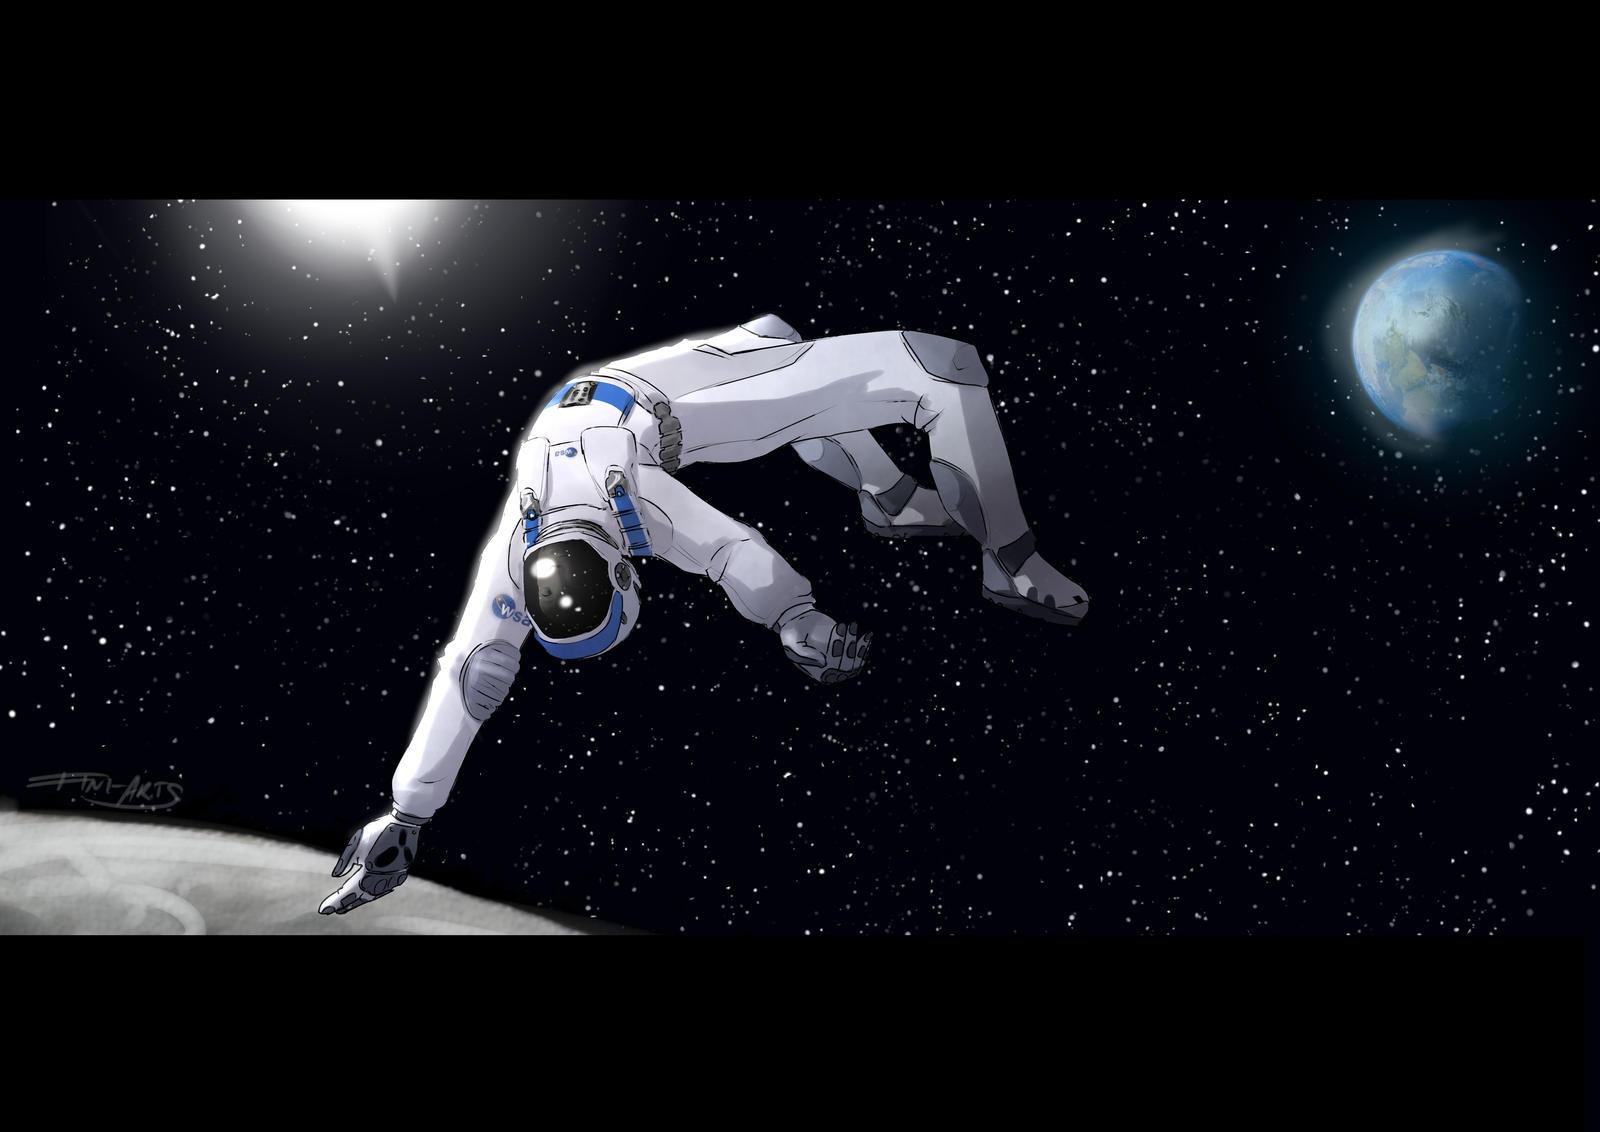 Astronaut Koen Floating In Space By Fini Arts On Deviantart